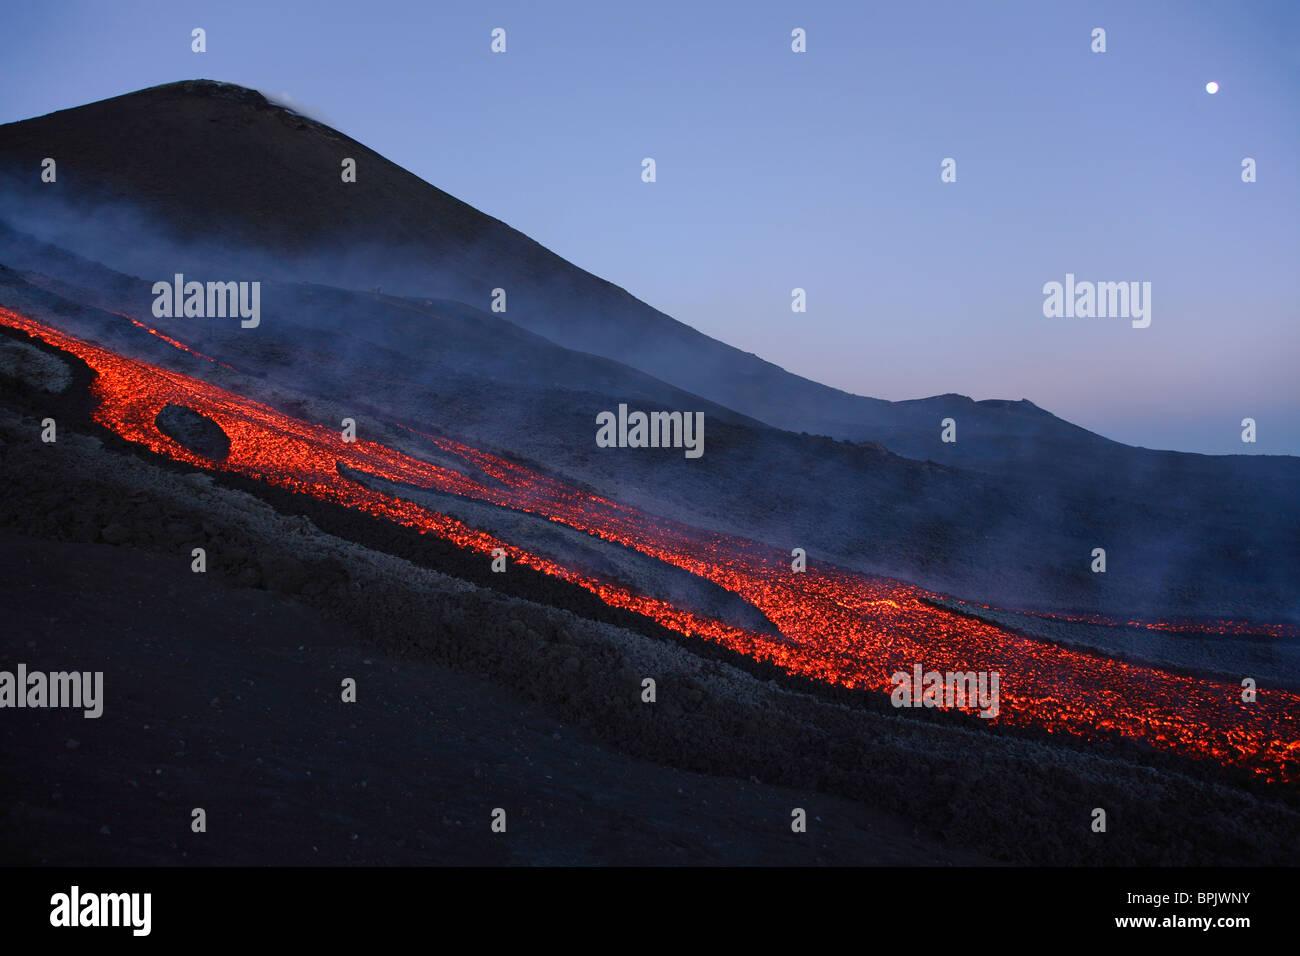 November 2, 2006 - Mount Etna lava flow in evening dawn, Sicily, Italy. - Stock Image